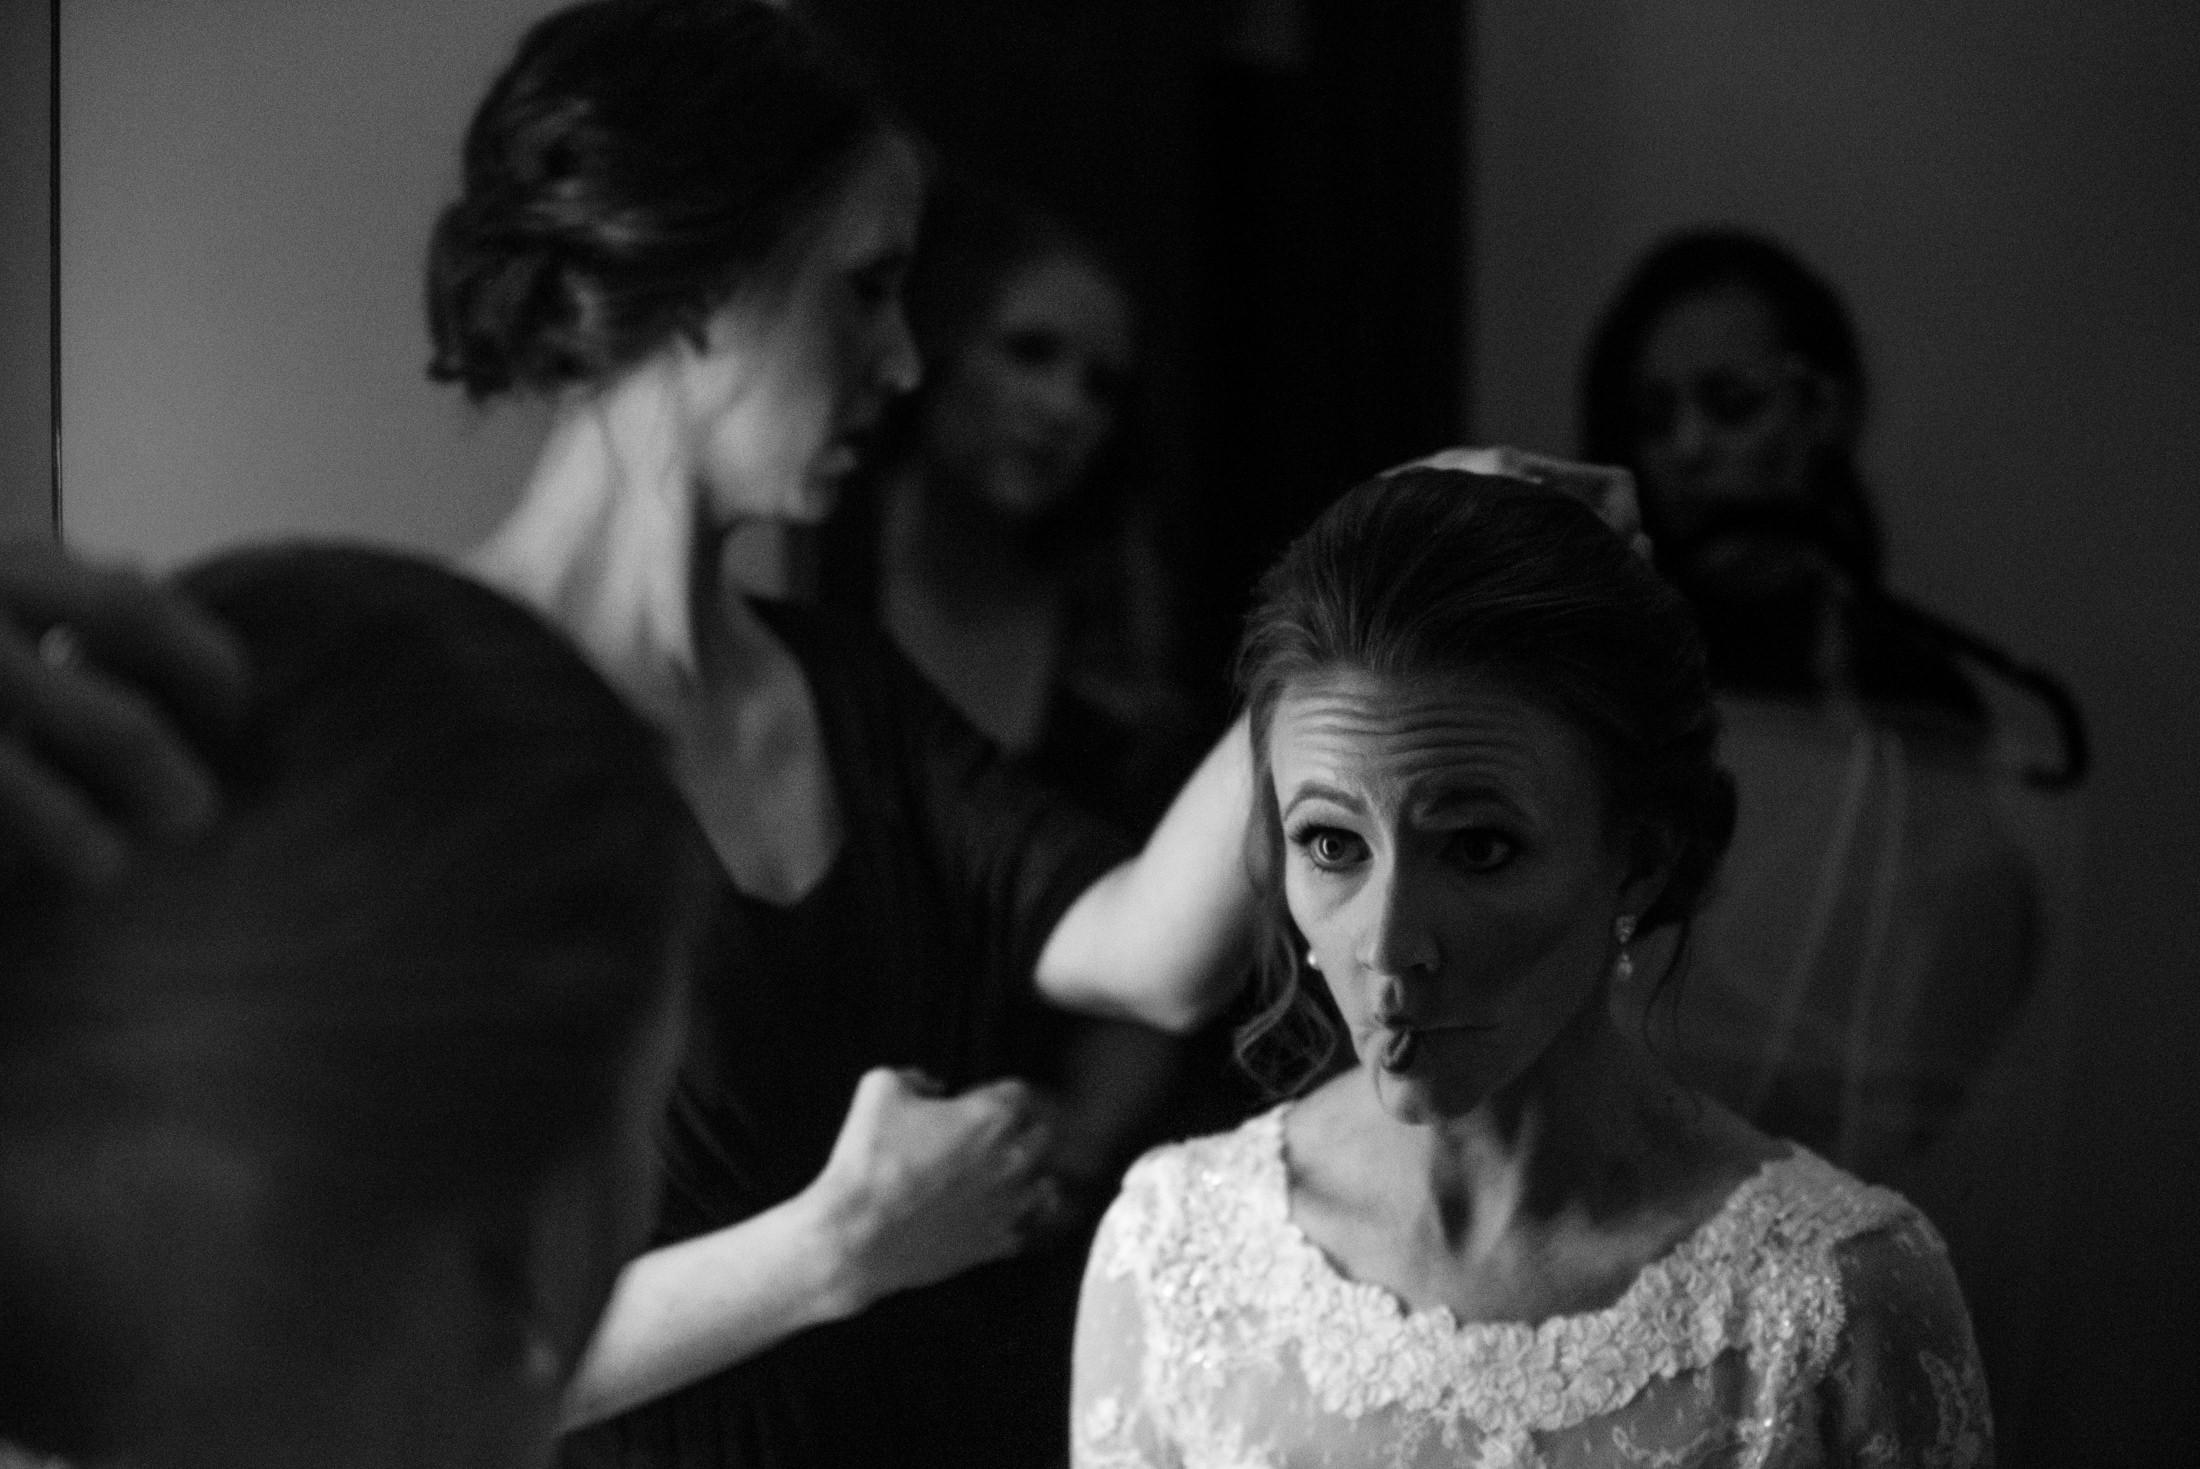 st-johns-creighton-omaha-wedding-photographer-jm-studios-0005.JPG